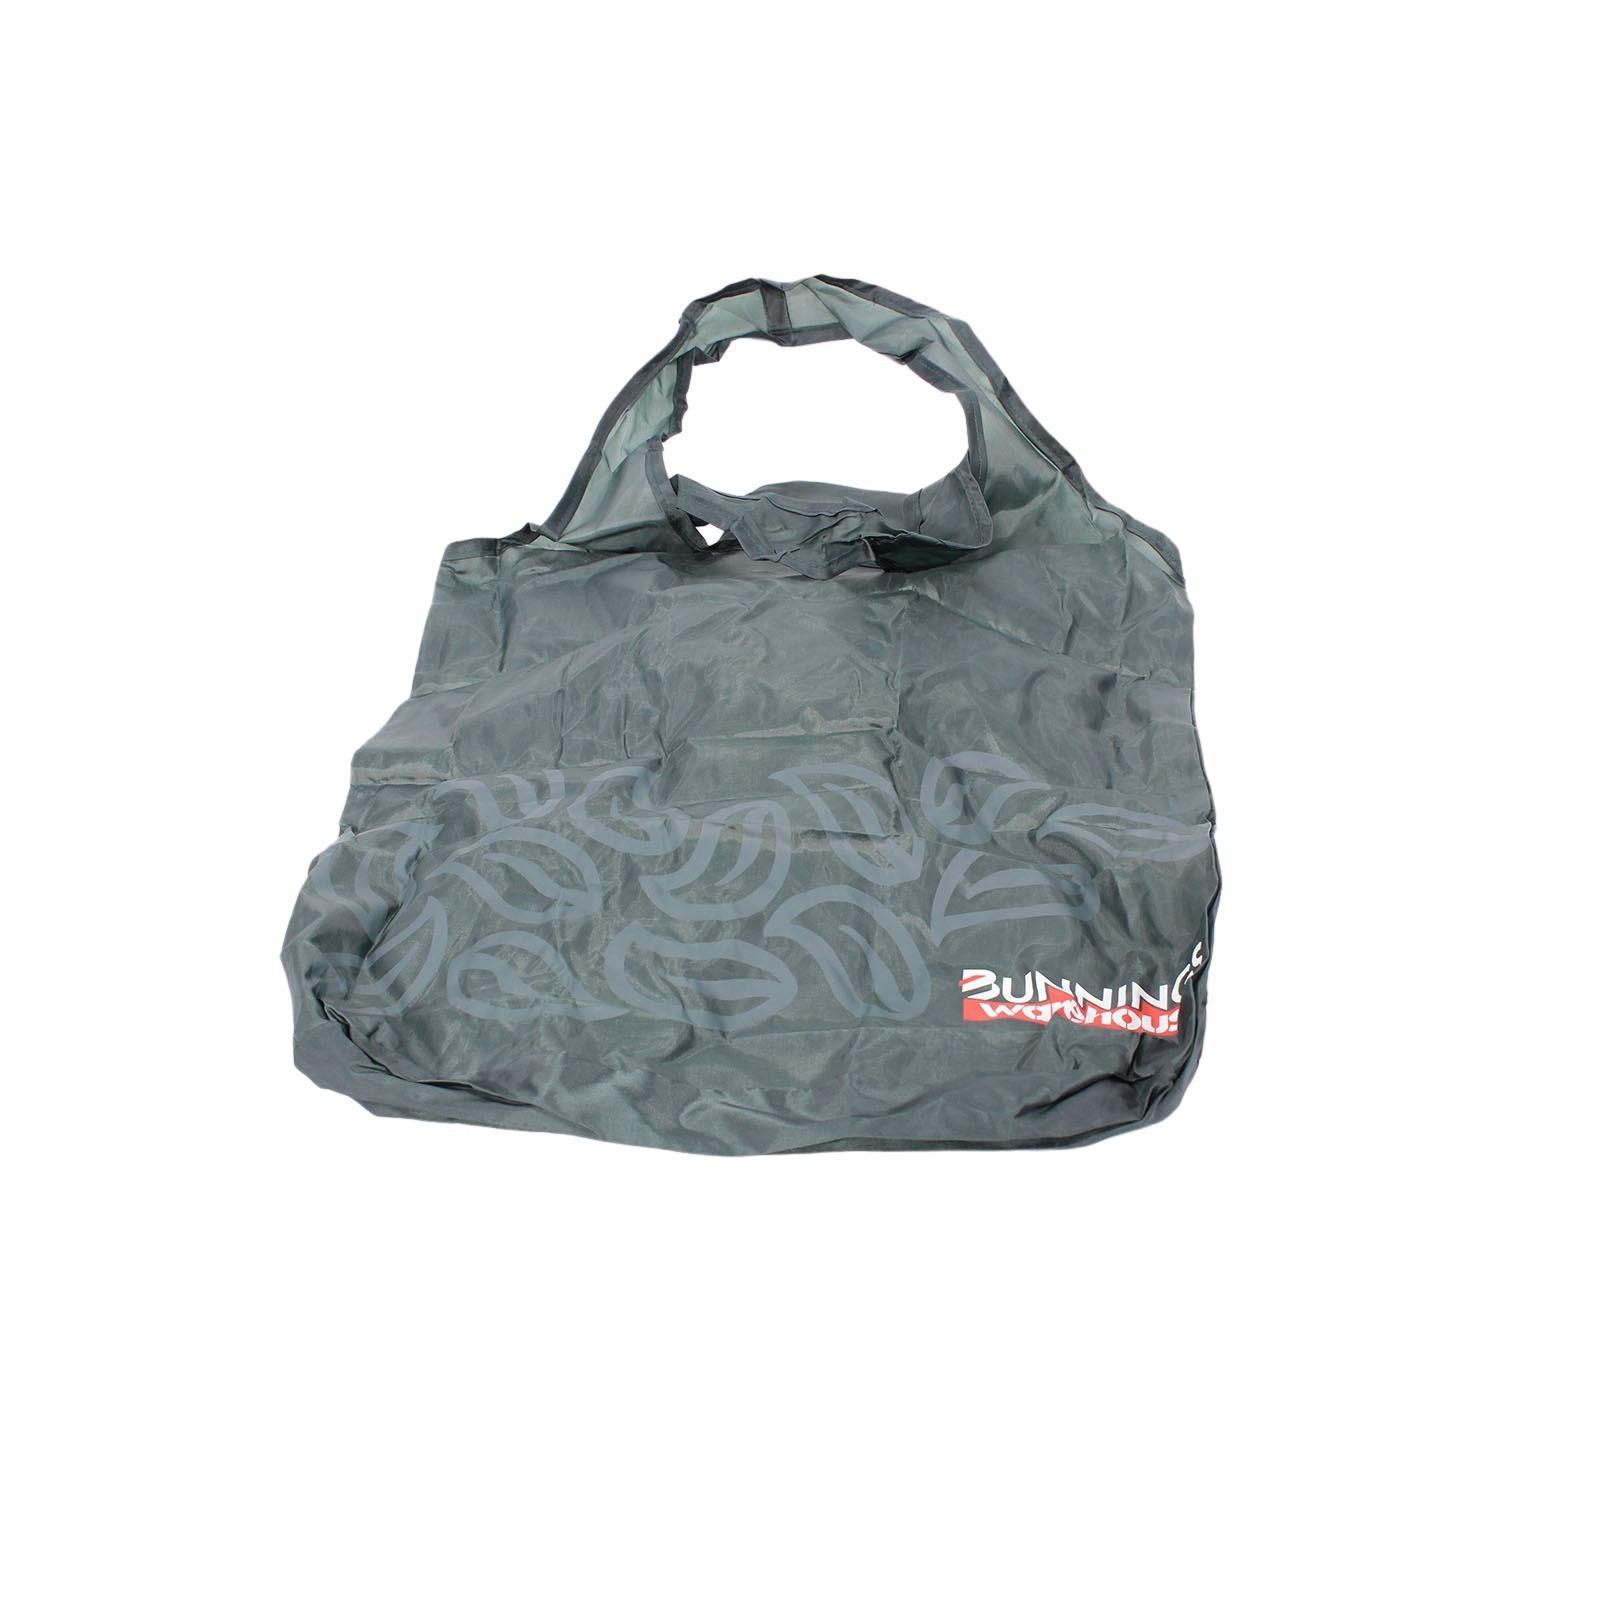 Bunnings Compact Bag